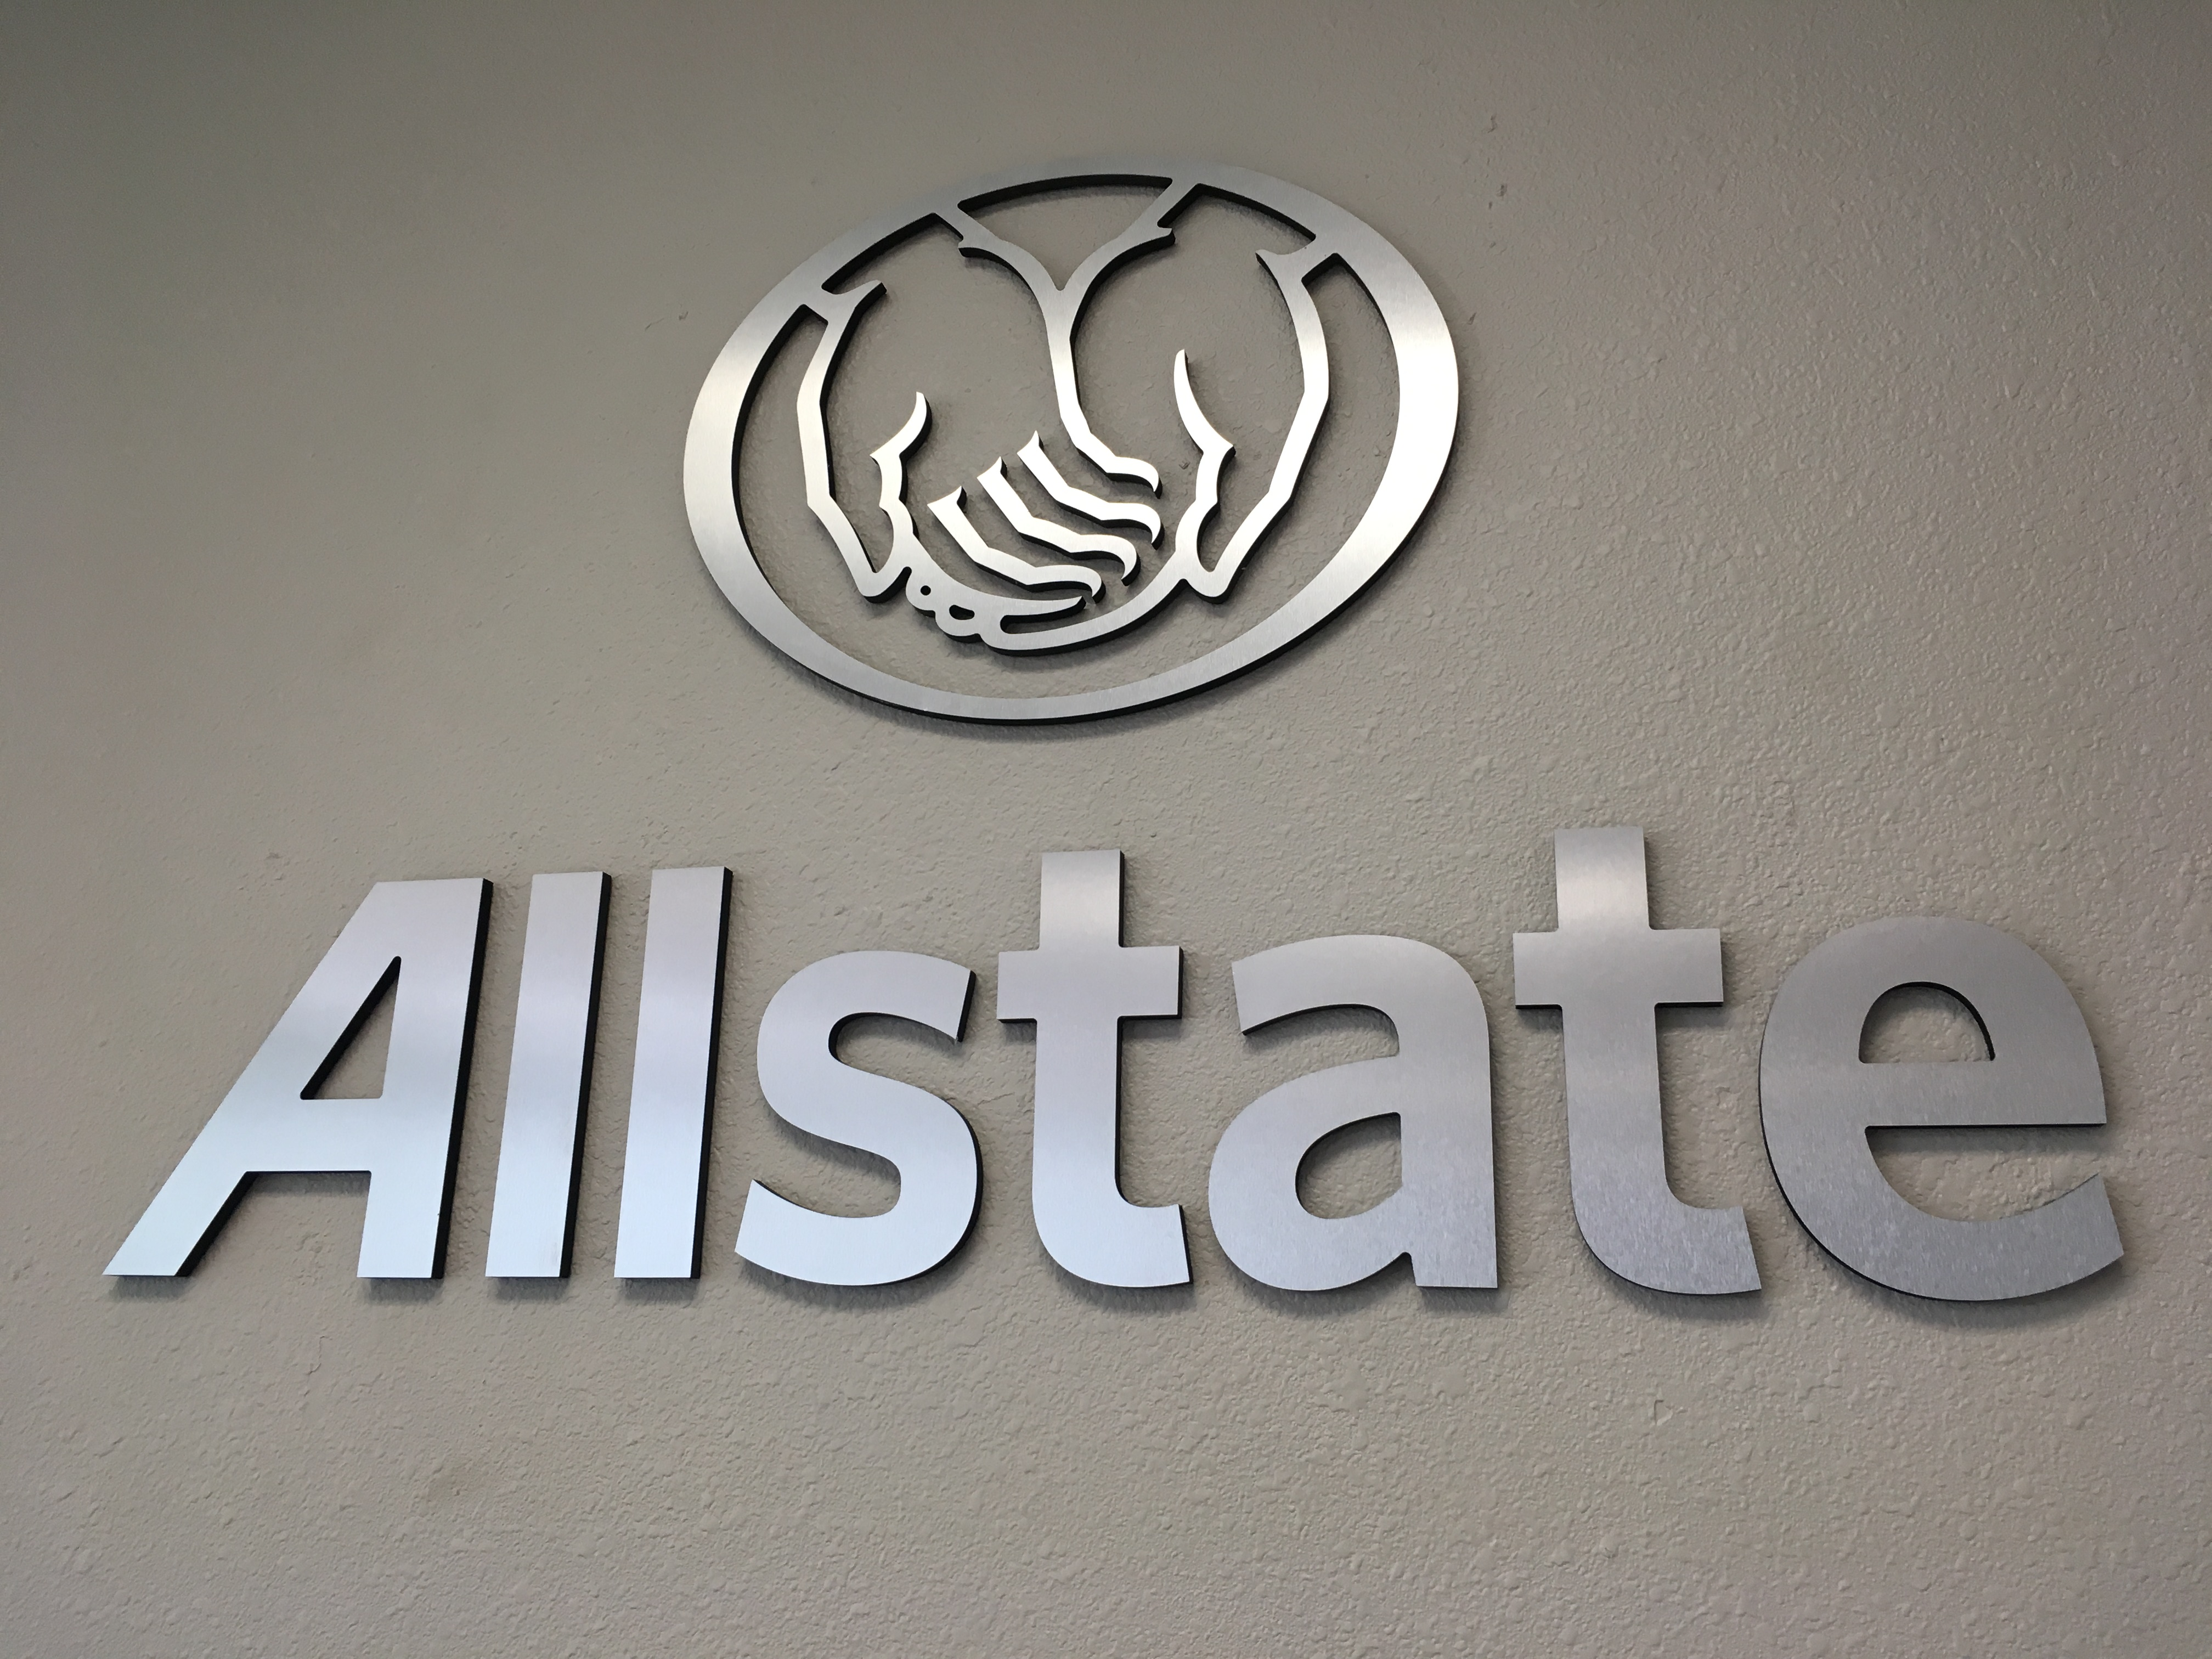 Allstate Insurance Agent: David D Harrington image 2